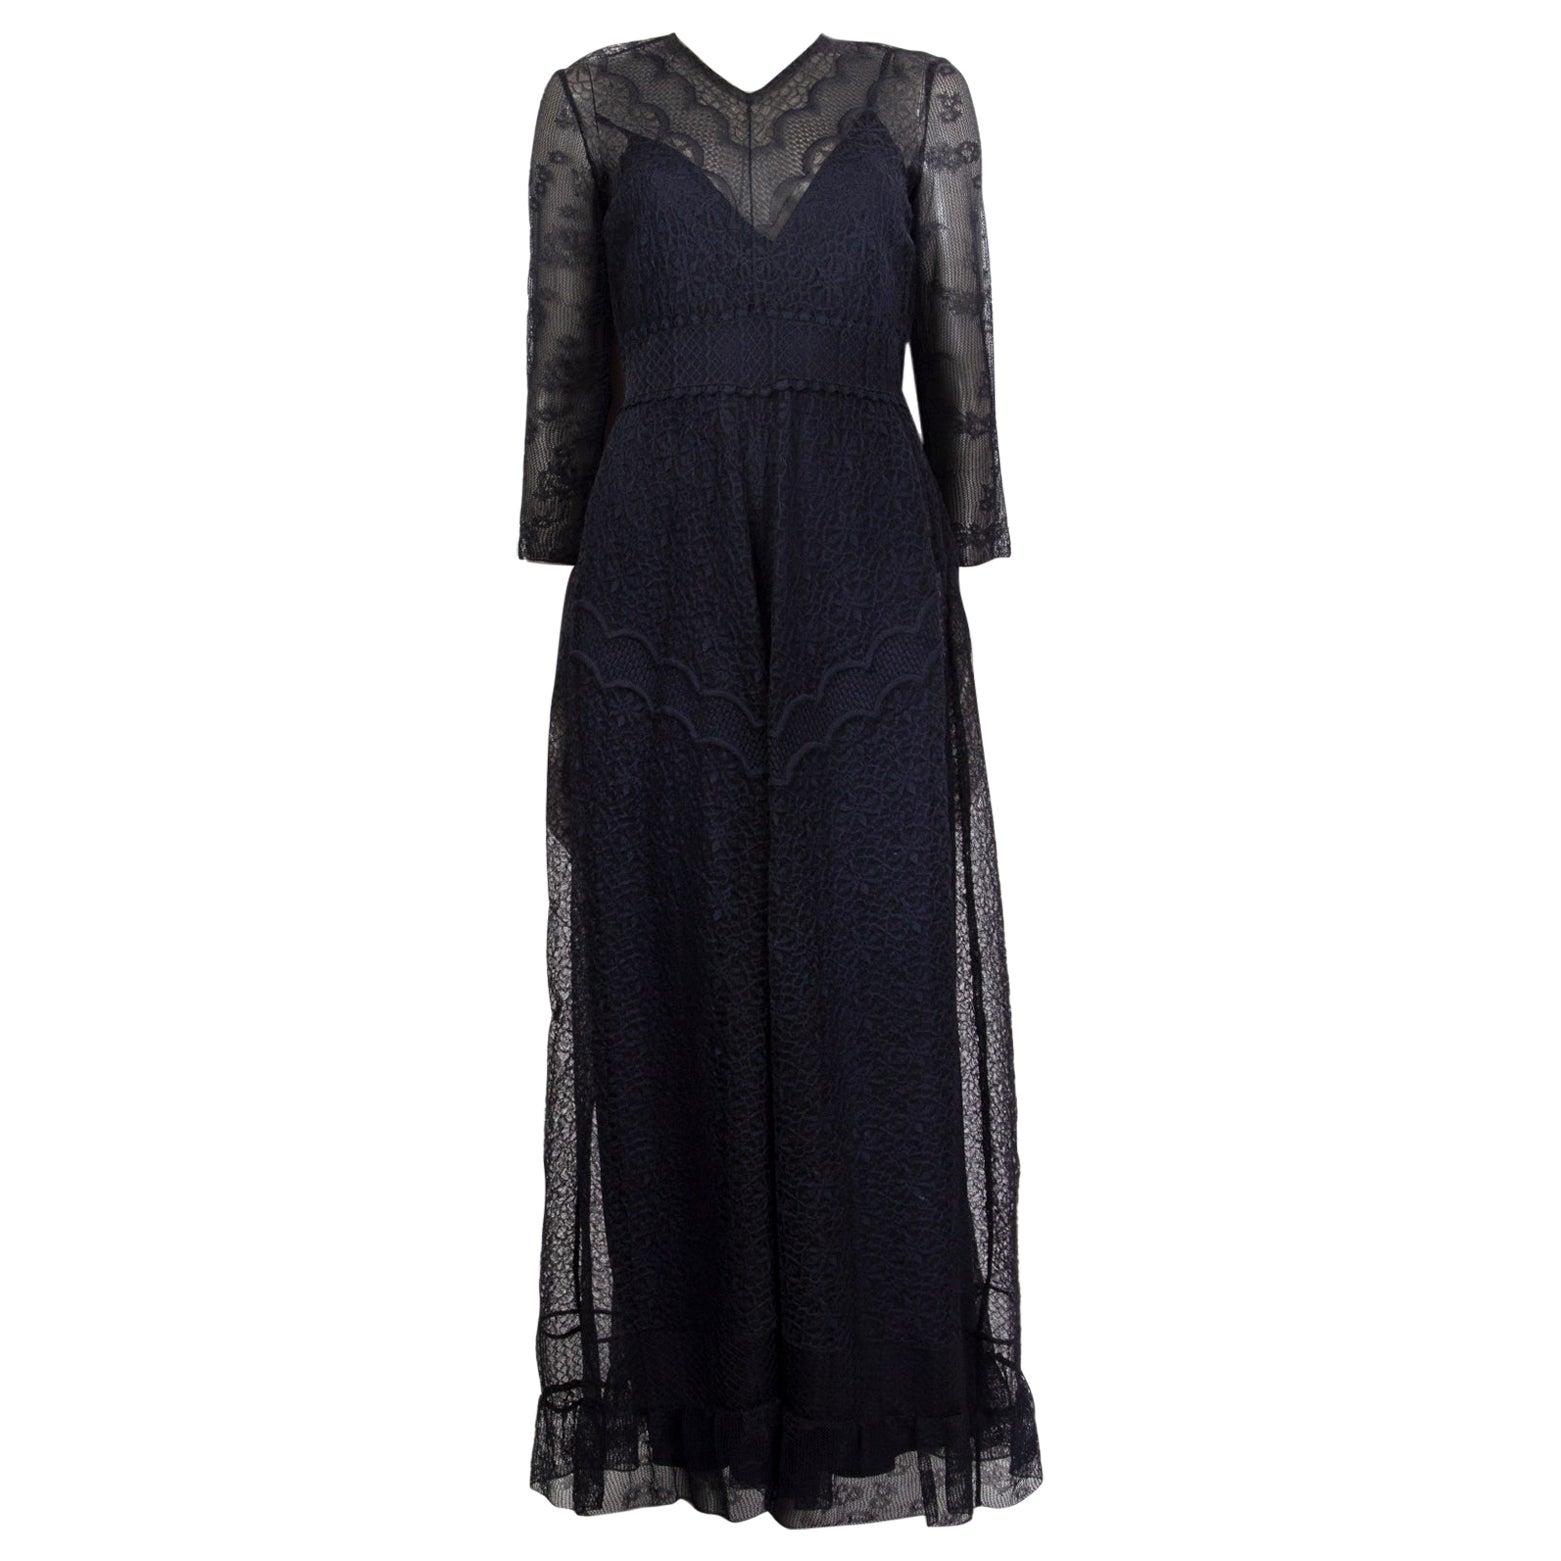 CHRISTIAN DIOR navy blue silk LACE KAFTAN Cocktail Dress 40